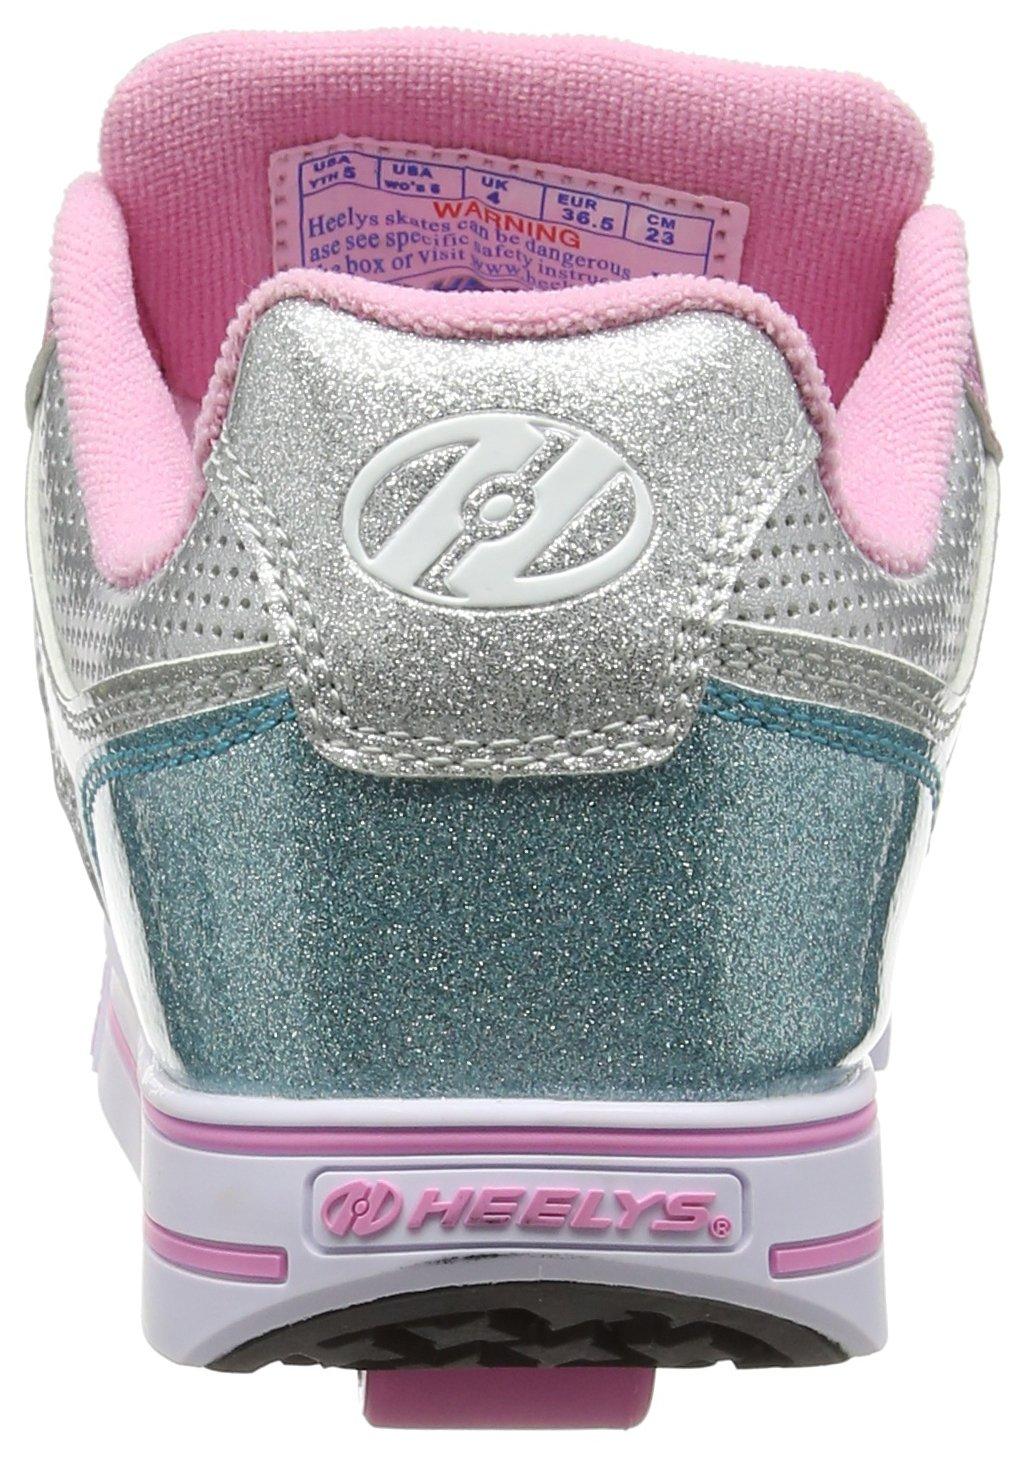 Heelys Girl's Motion Plus (Little Kid/Big Kid/Adult) Silver/Pink/Blue/Glitter Shoe by Heelys (Image #2)